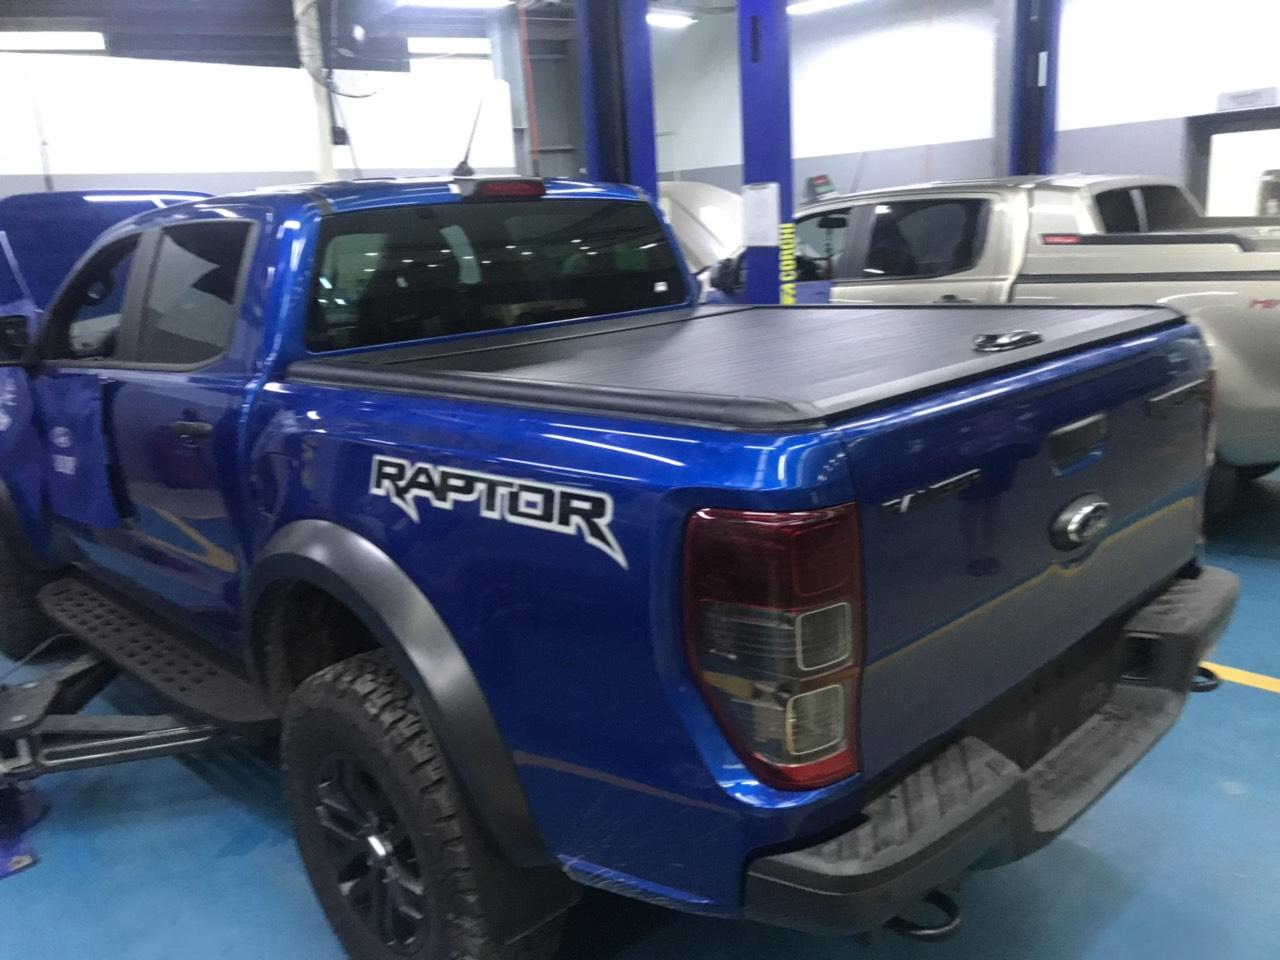 nap thung Ford Ranger raptor cuon keo